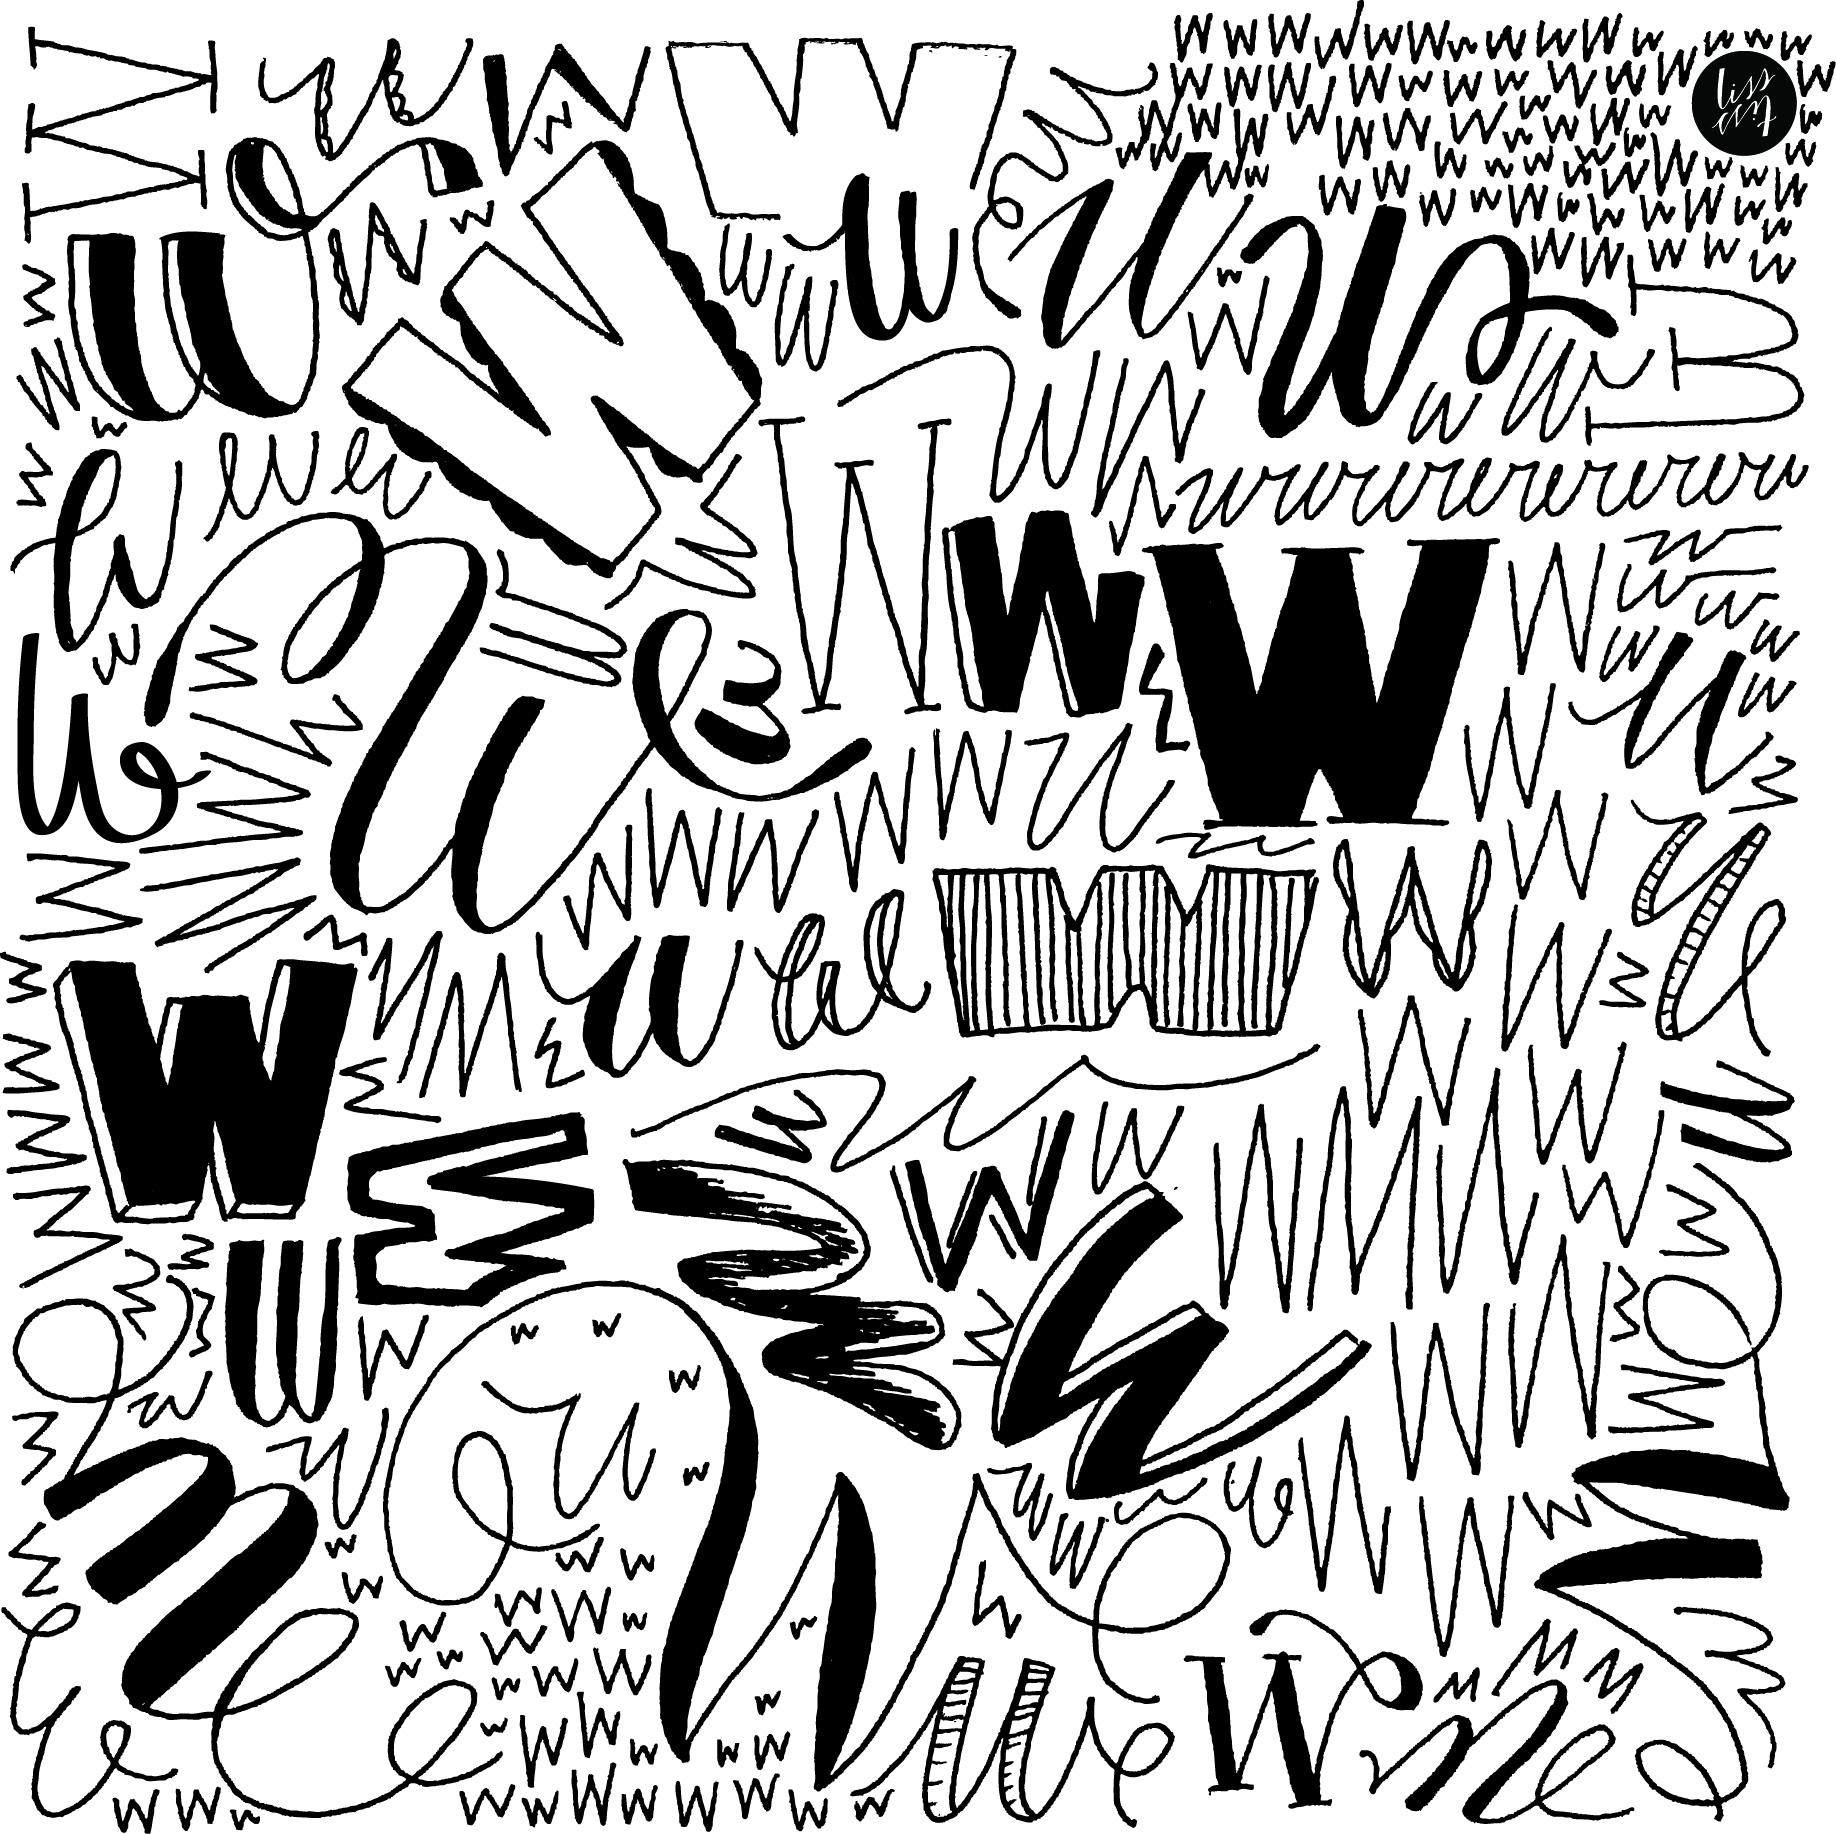 Typo-Textural W.jpg